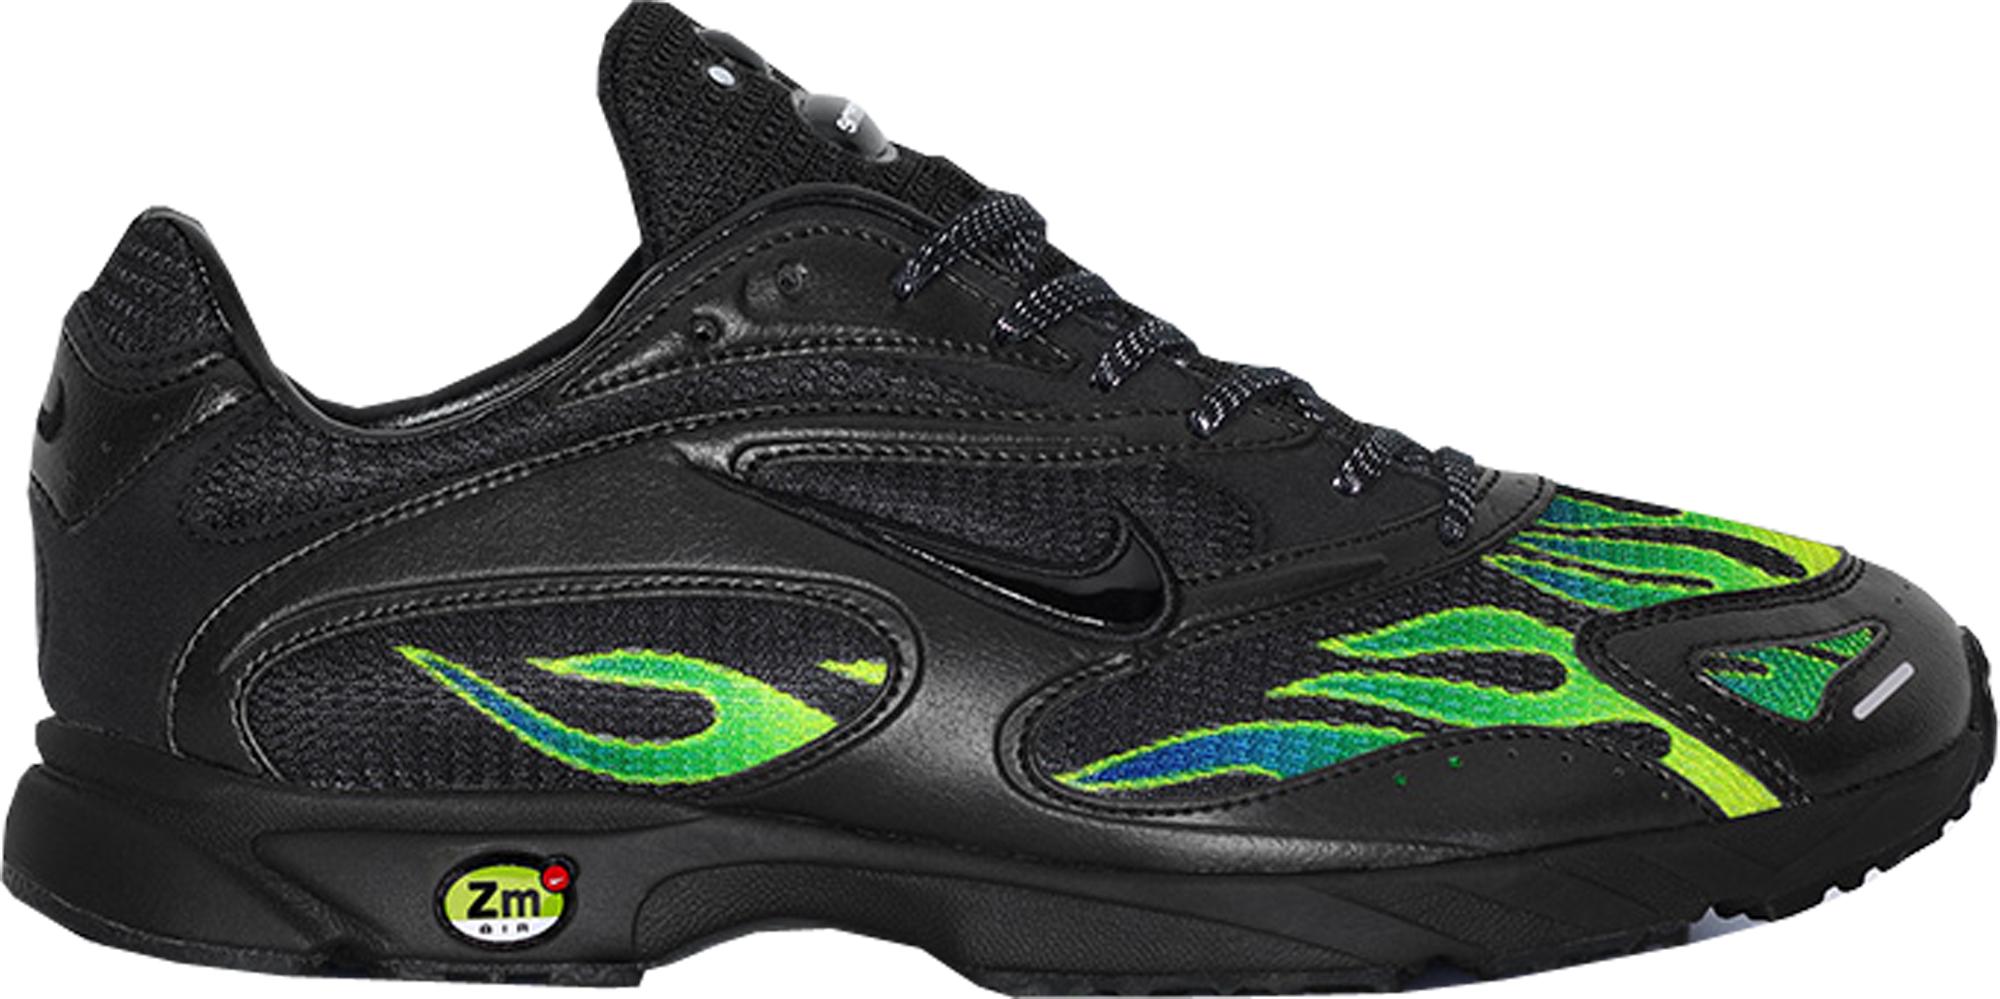 Nike Zoom Streak Spectrum Plus Supreme Black